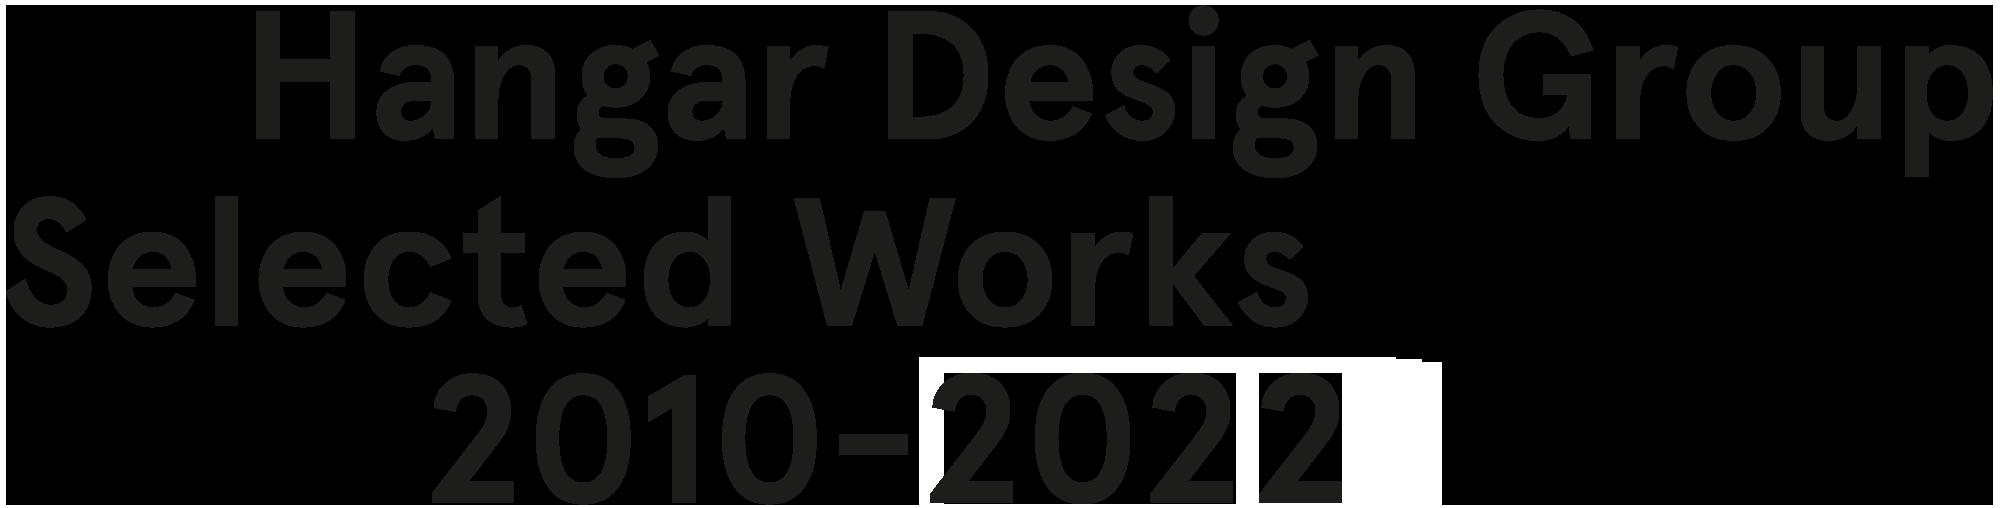 Hangar Design Group Selected Works 2010/2017